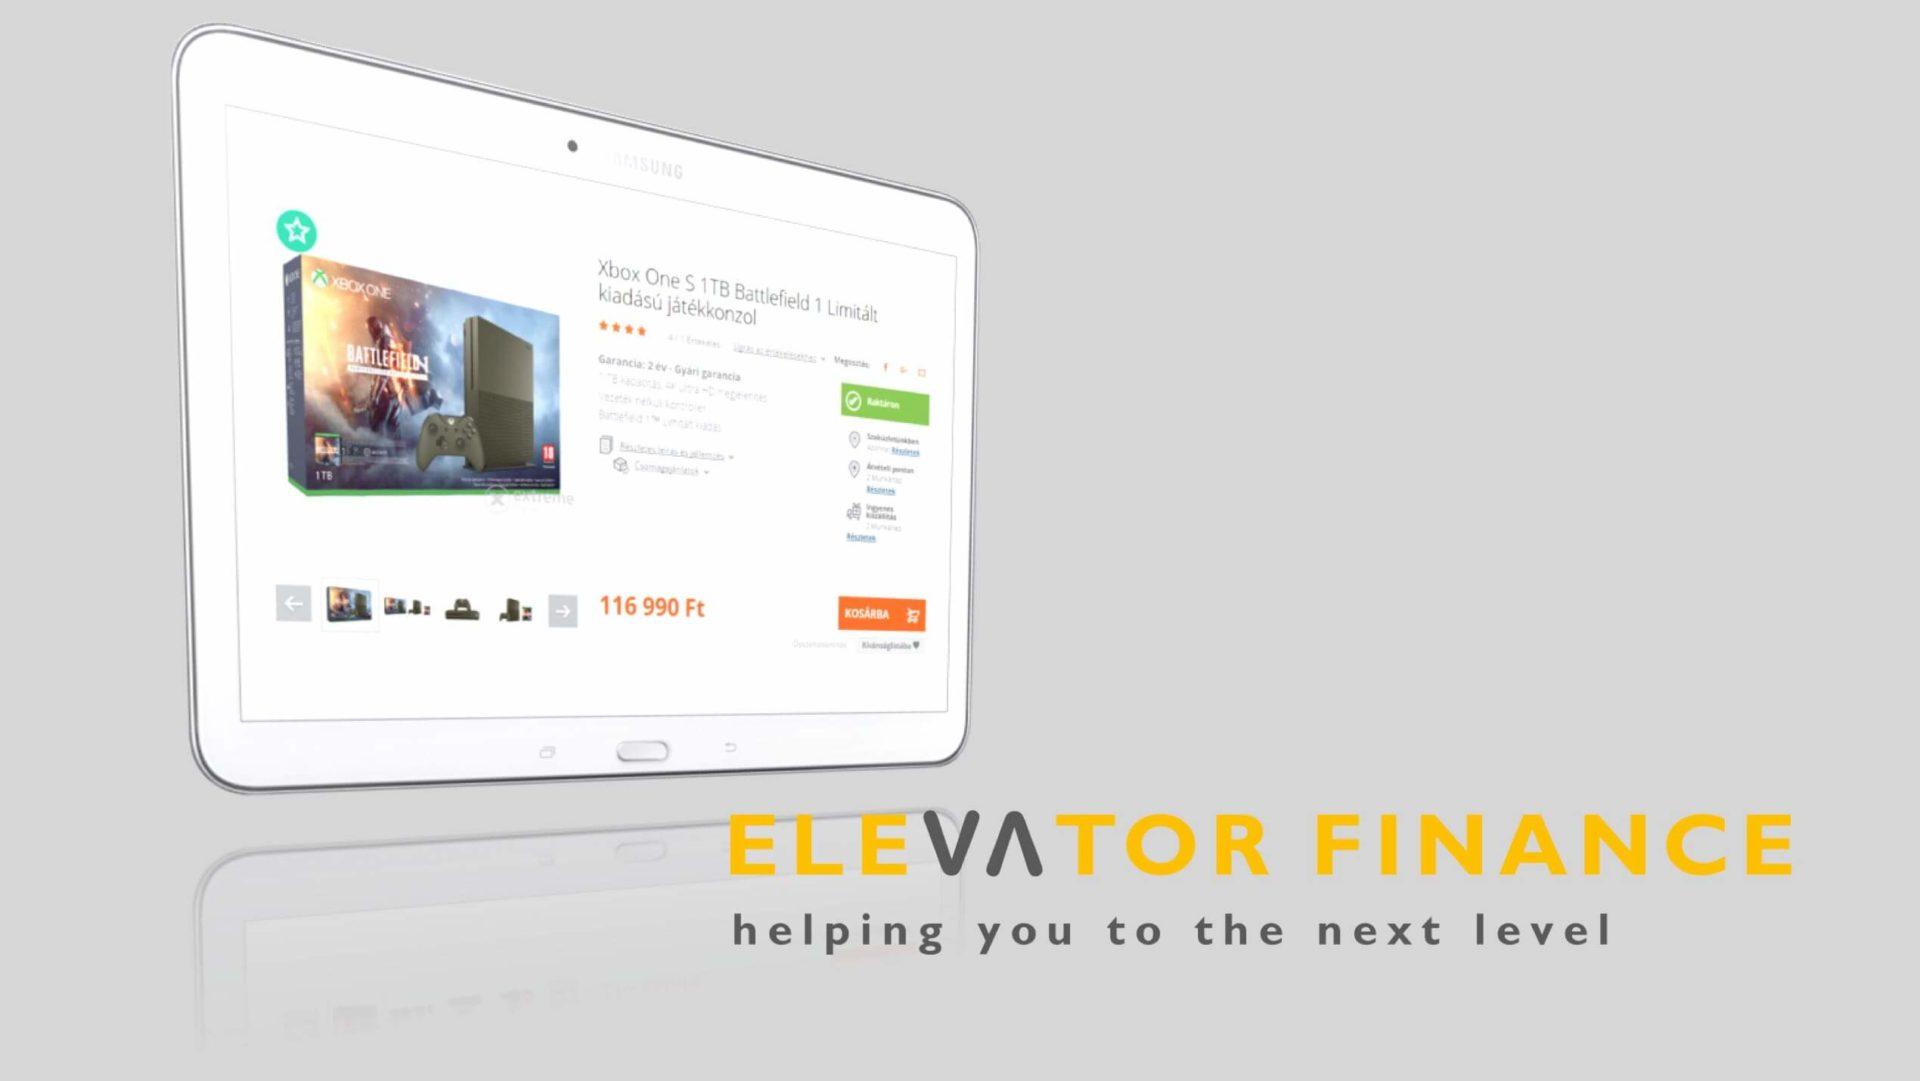 elevator finance áruhitel MKB FinTech Verseny